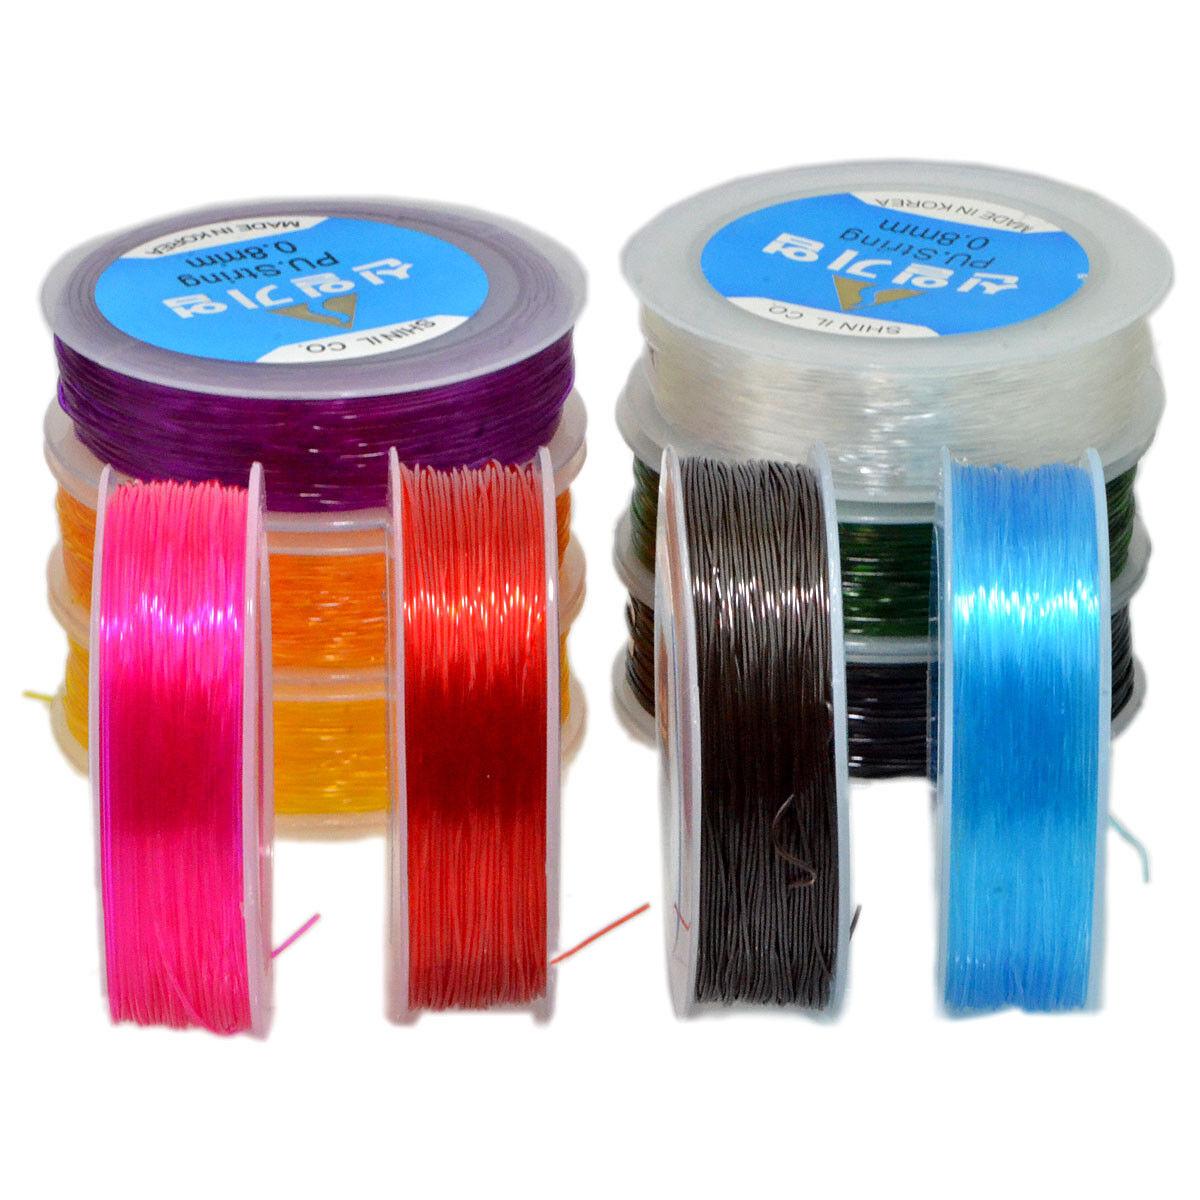 Korean Strong Stretchy Elastic String Cord Thread For Diy Br